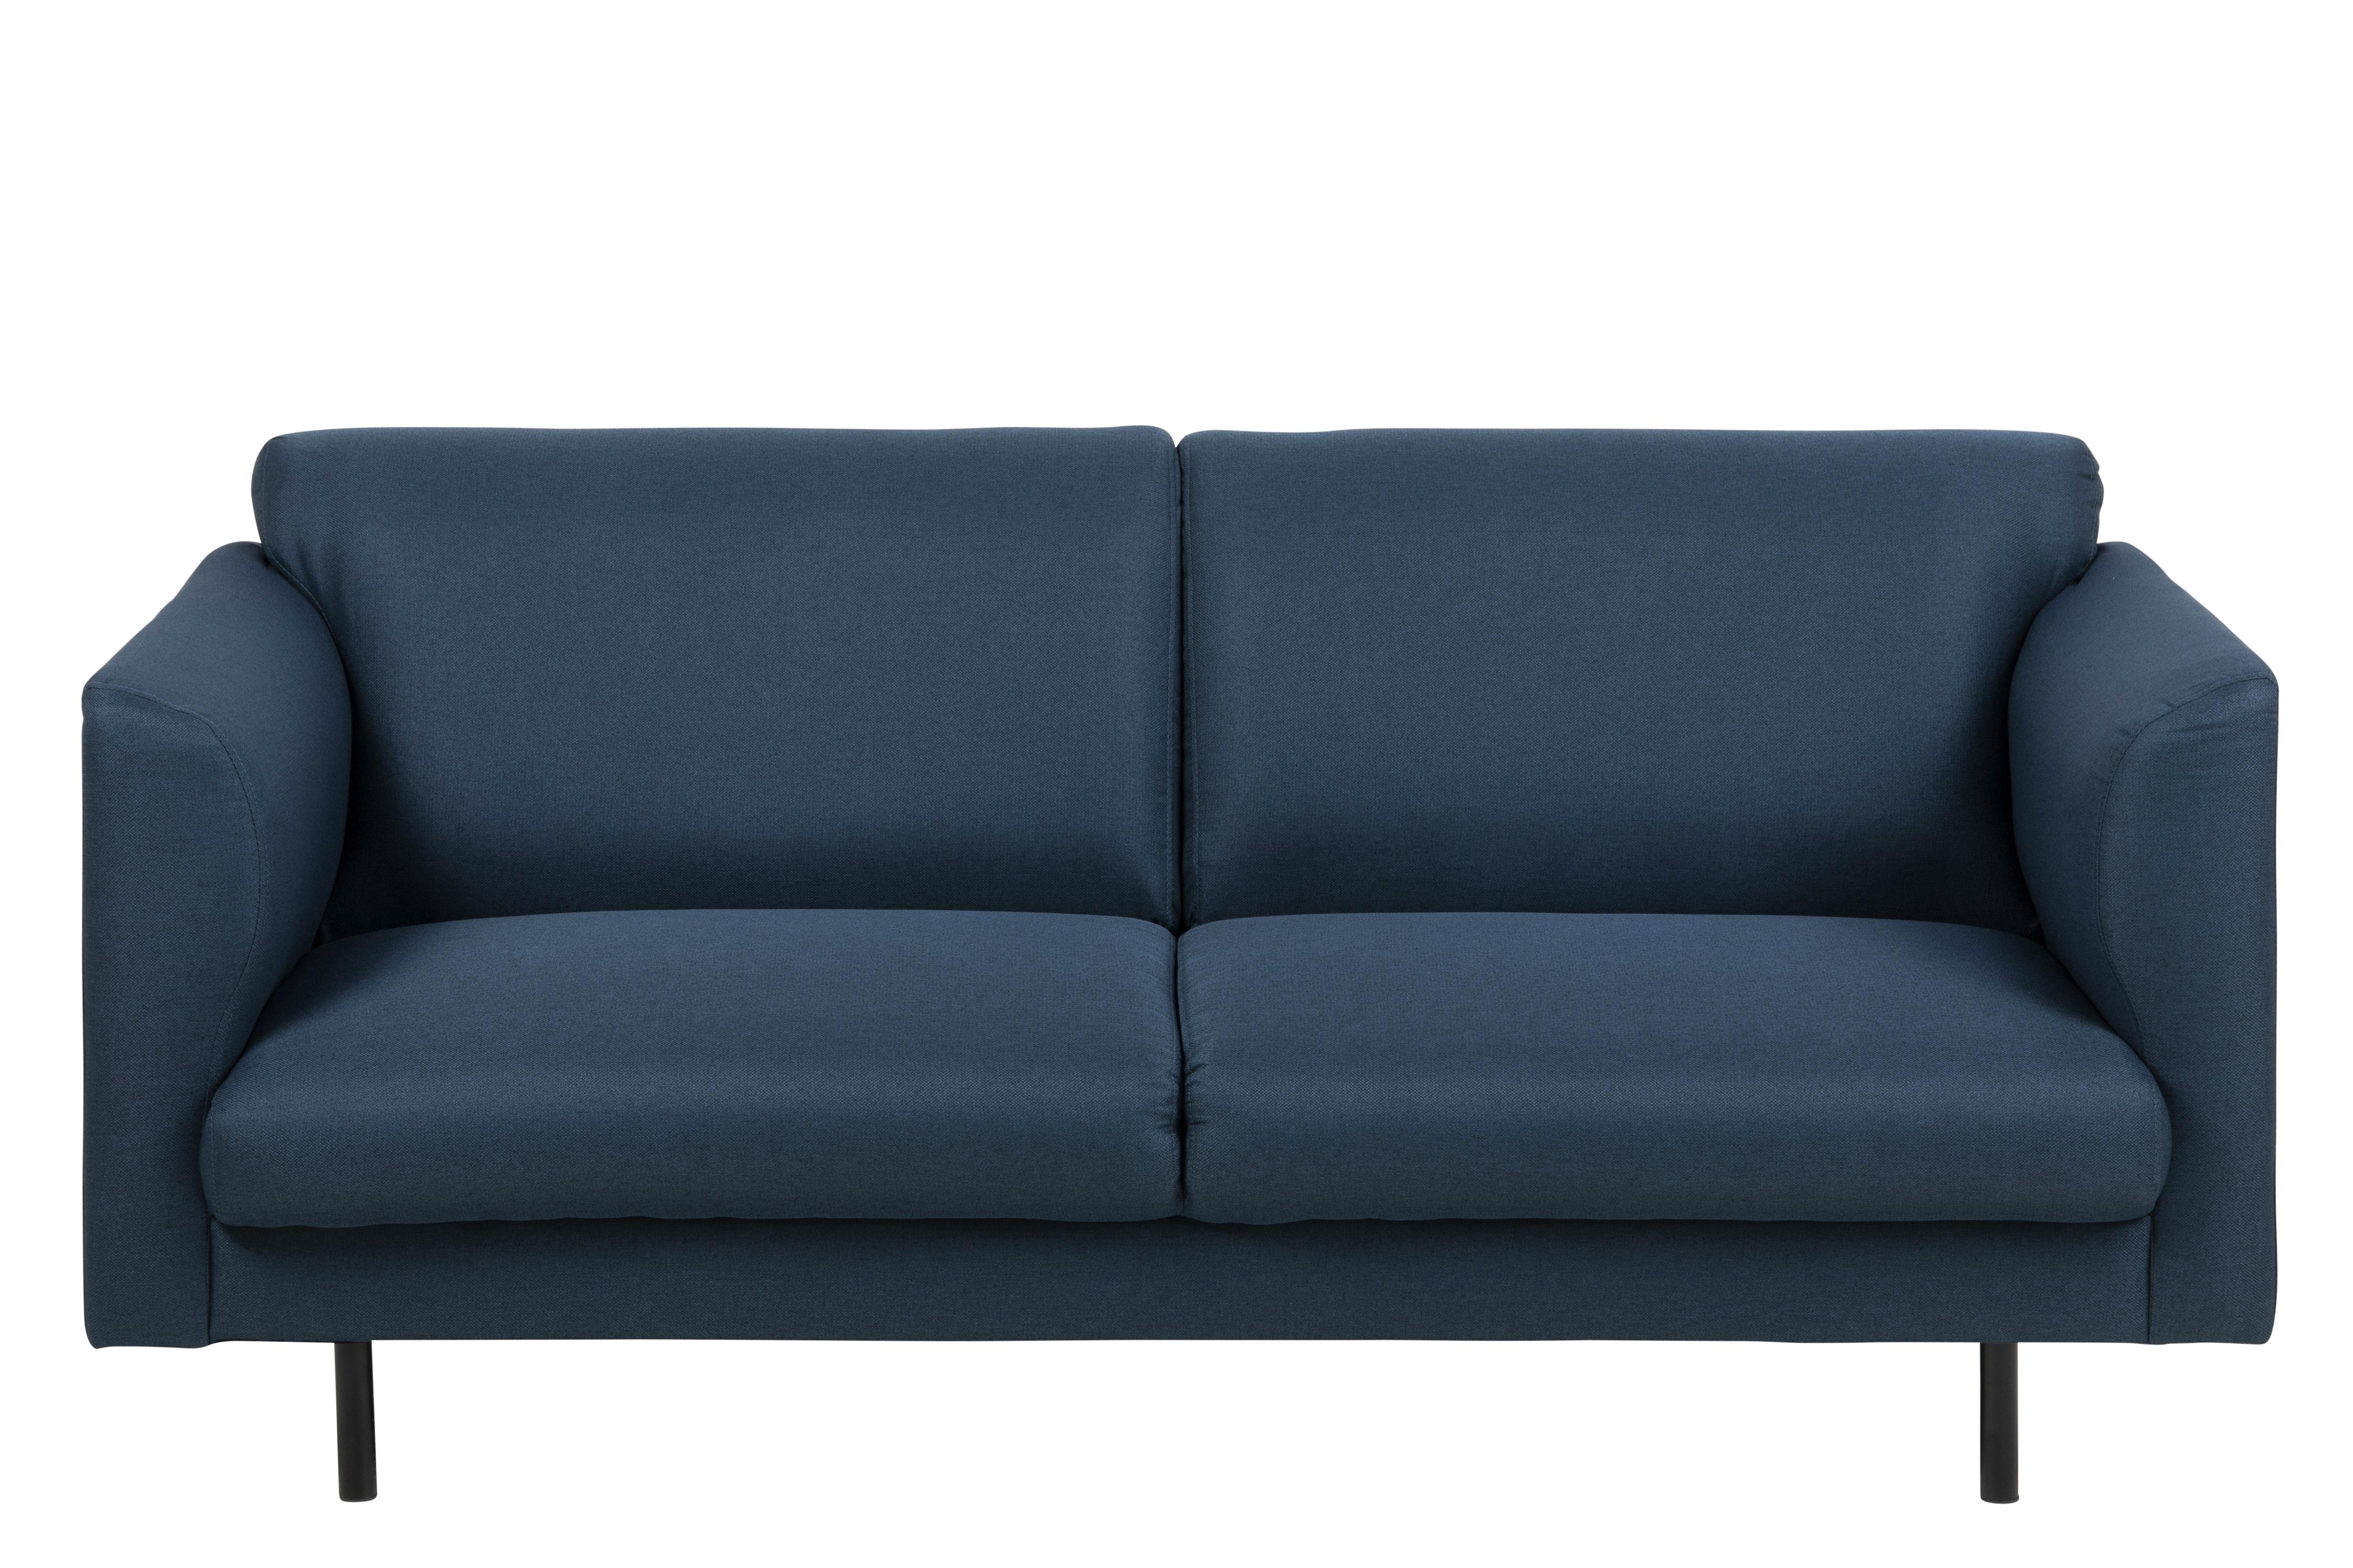 Canapea 2 locuri Conley Dark Blue